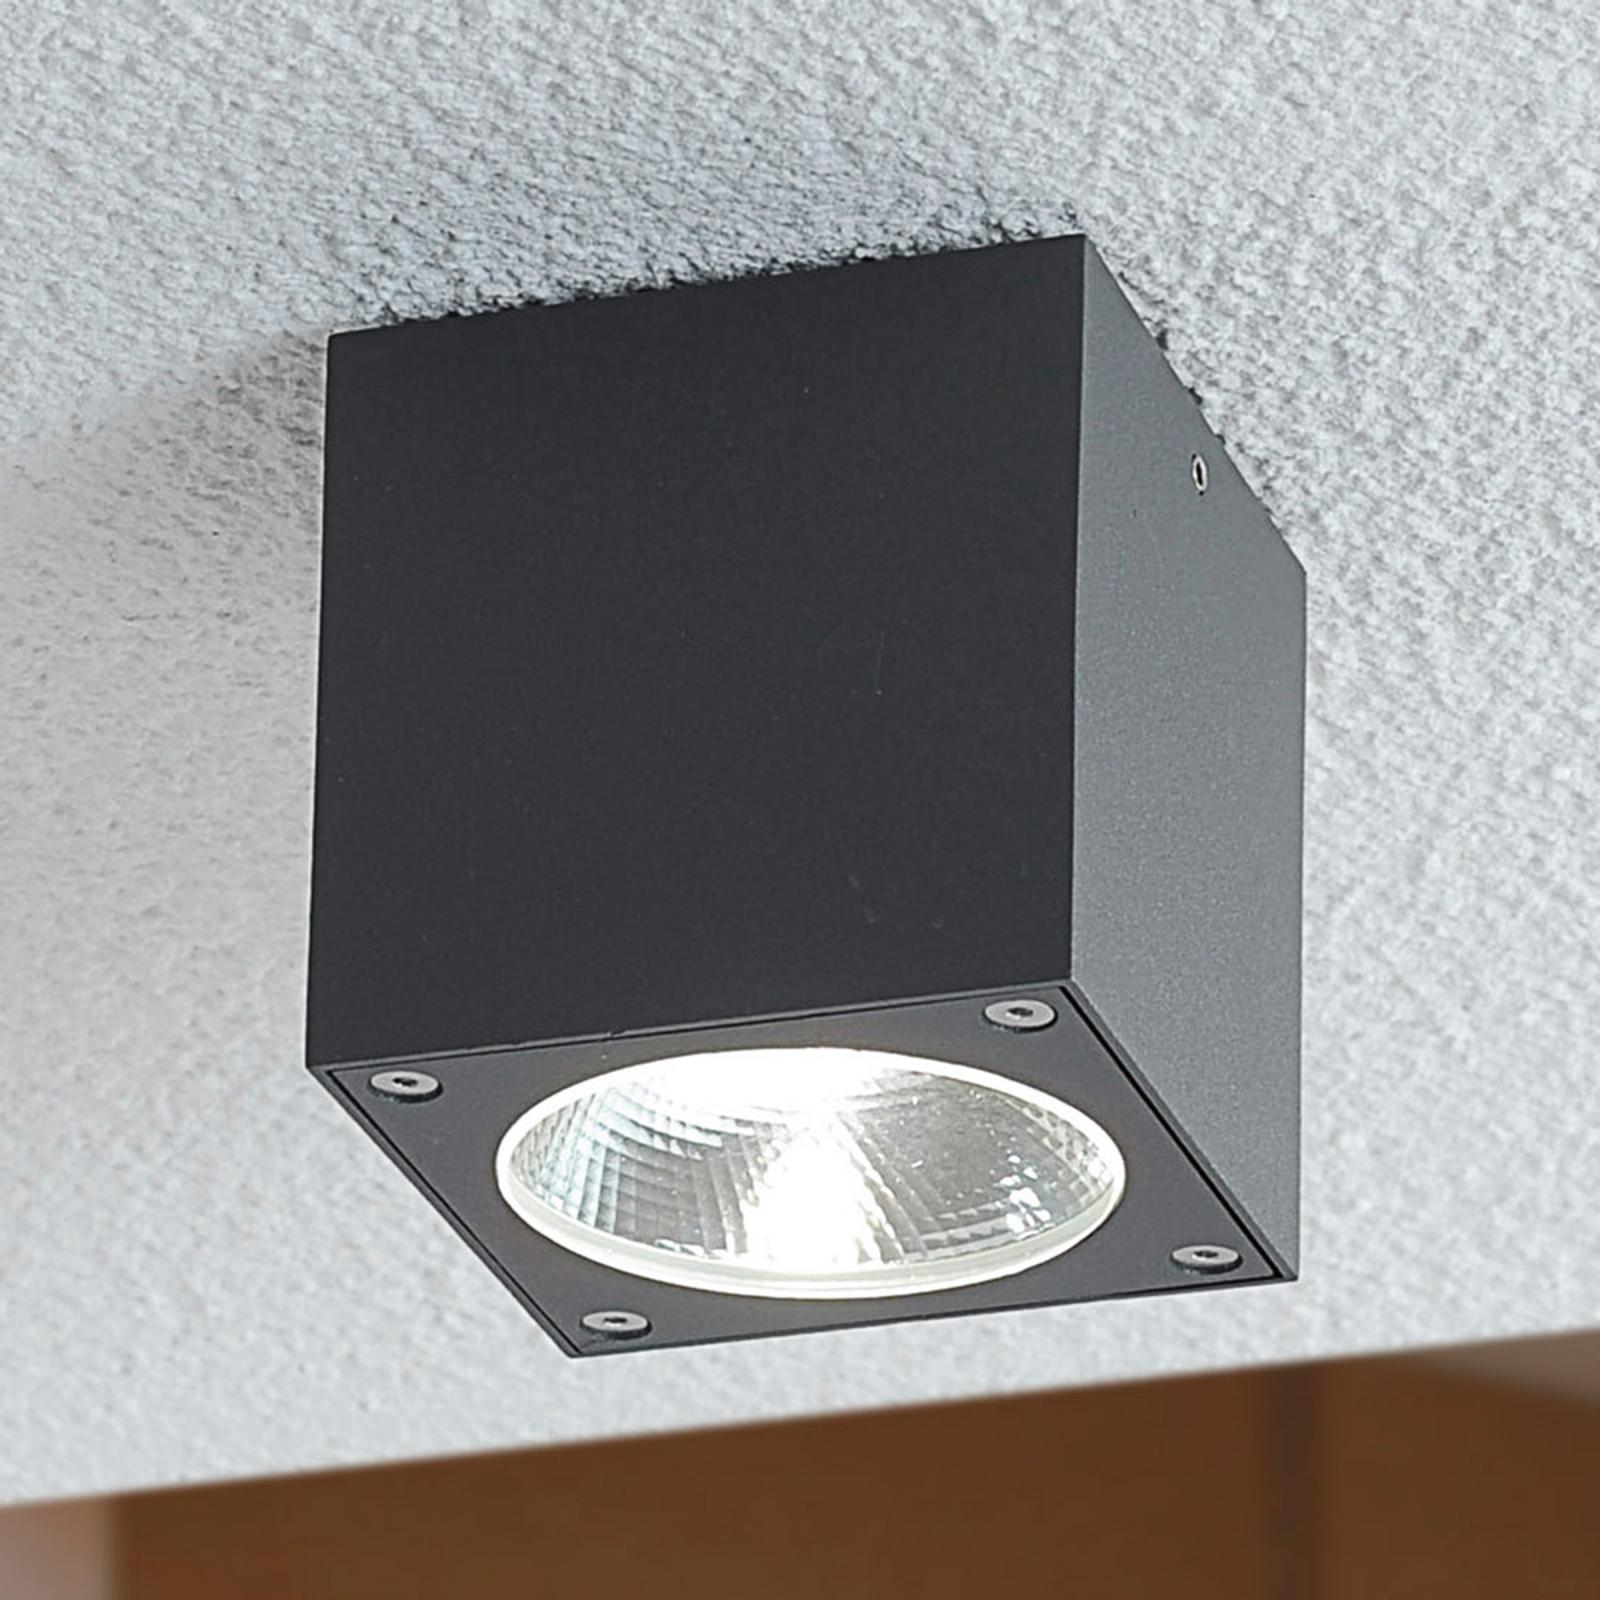 Lukas - terningeformet LED-udendørsloftslampe